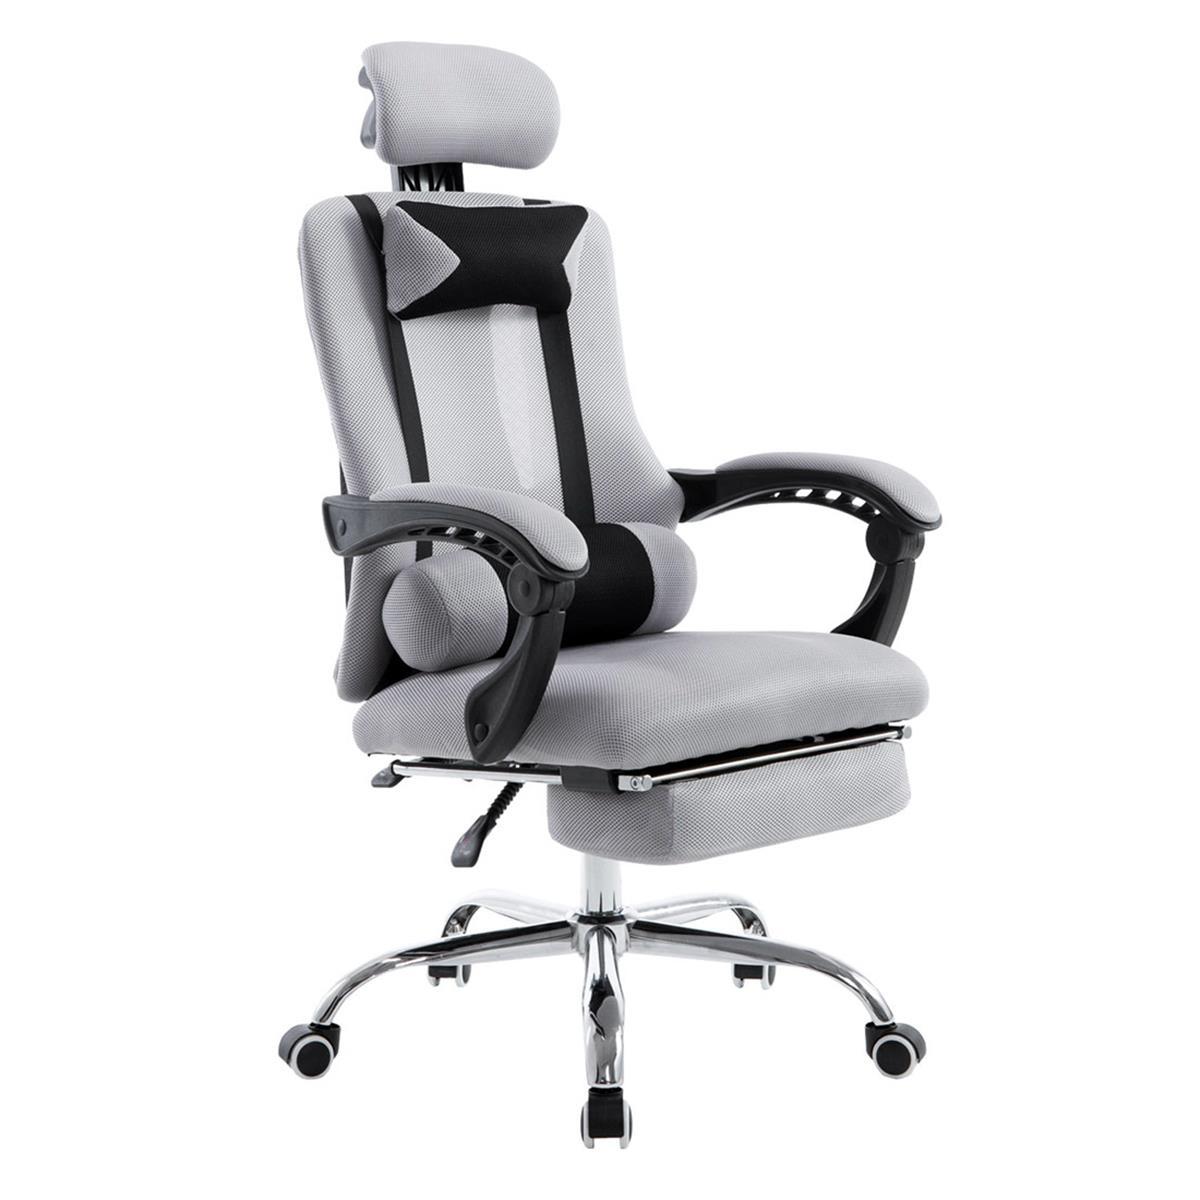 Silla de oficina antares reclinable en varias posiciones - Reposapies oficina ...